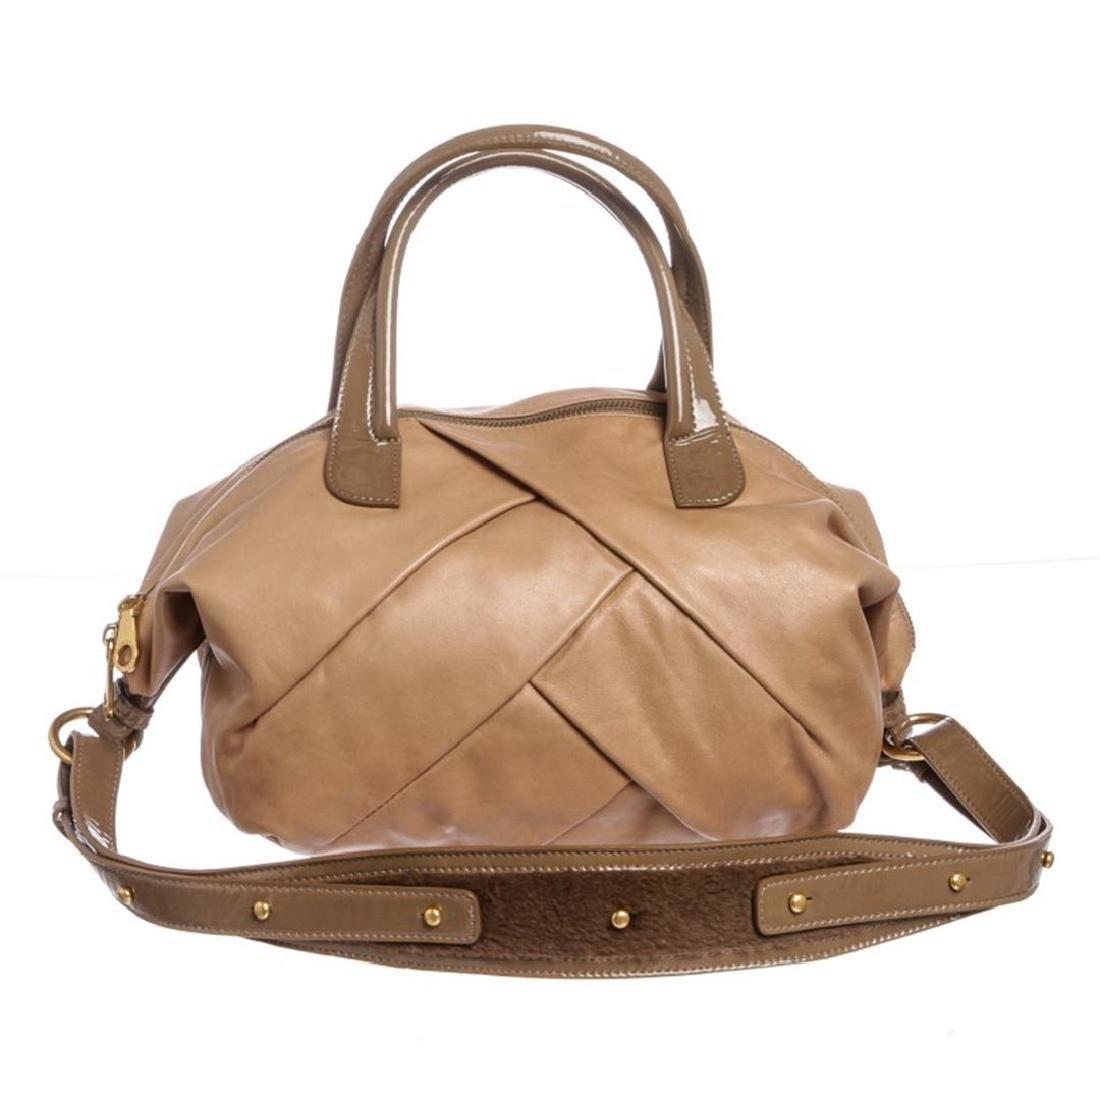 Marc by Marc Jacobs Tan Leather Satchel Handbag